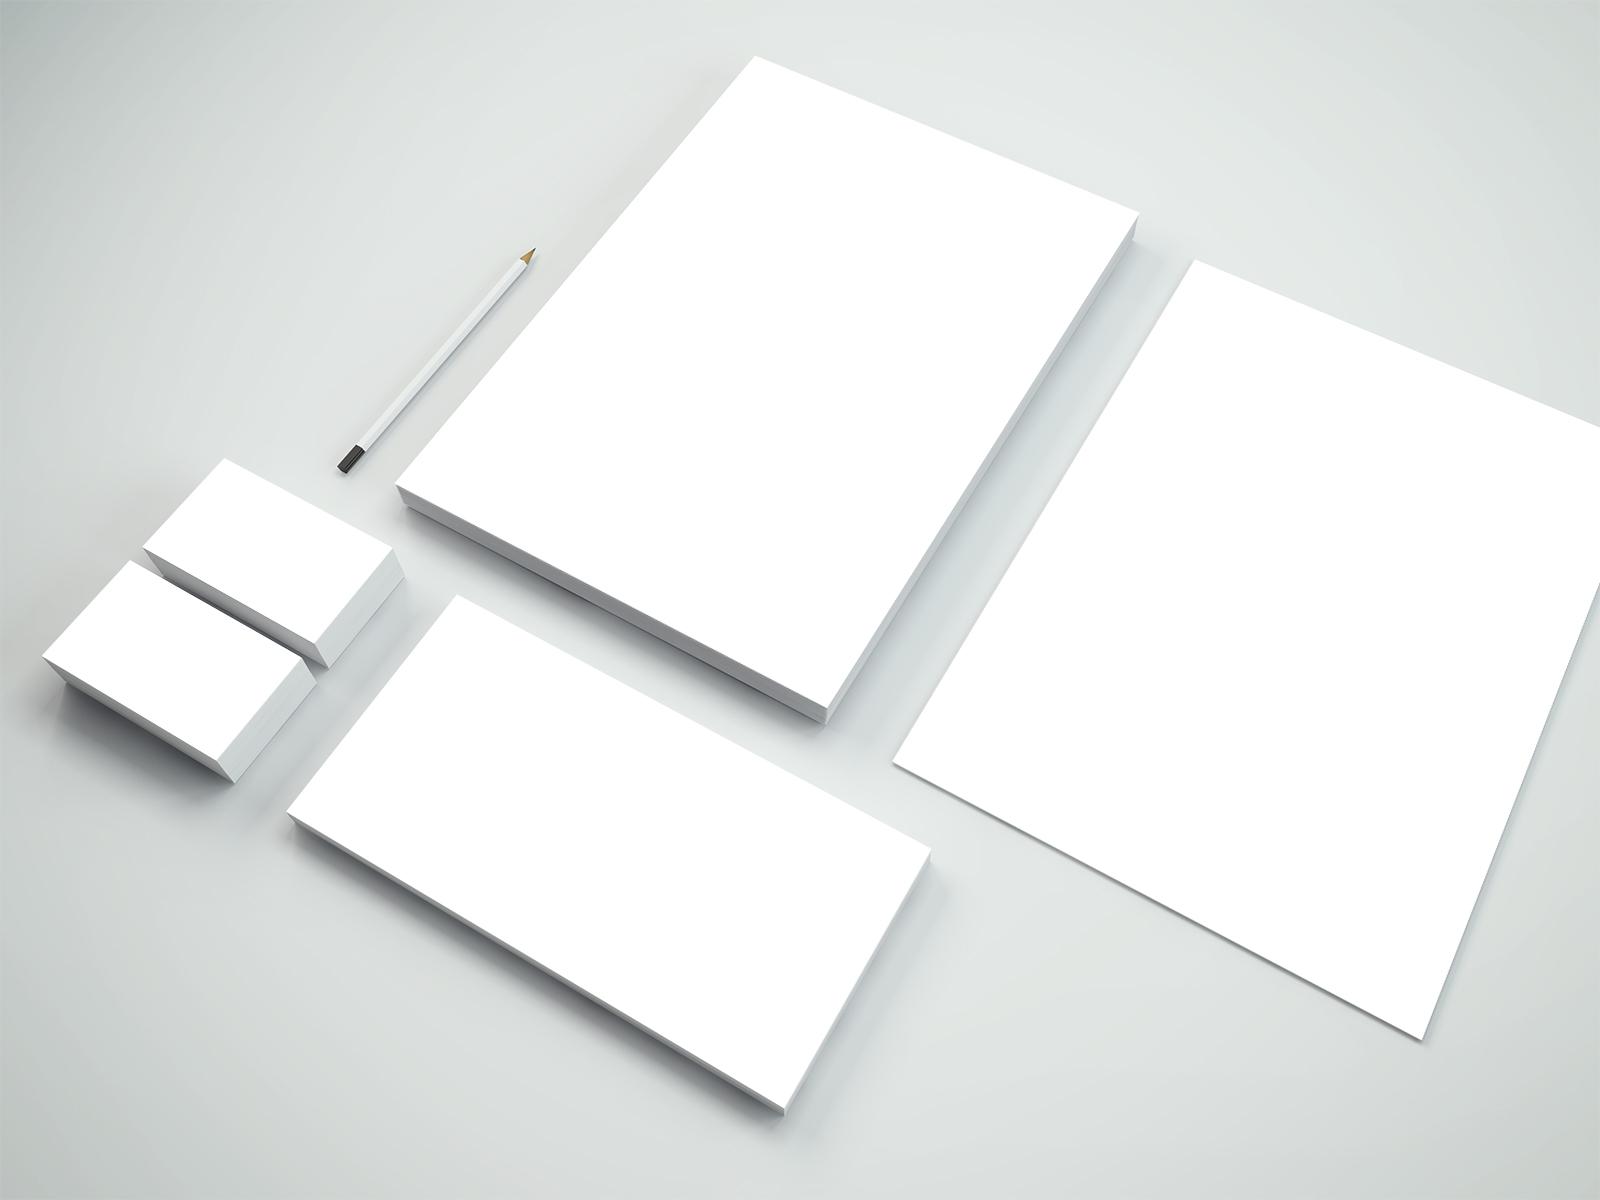 Branding Stationery PSD Mockup #6